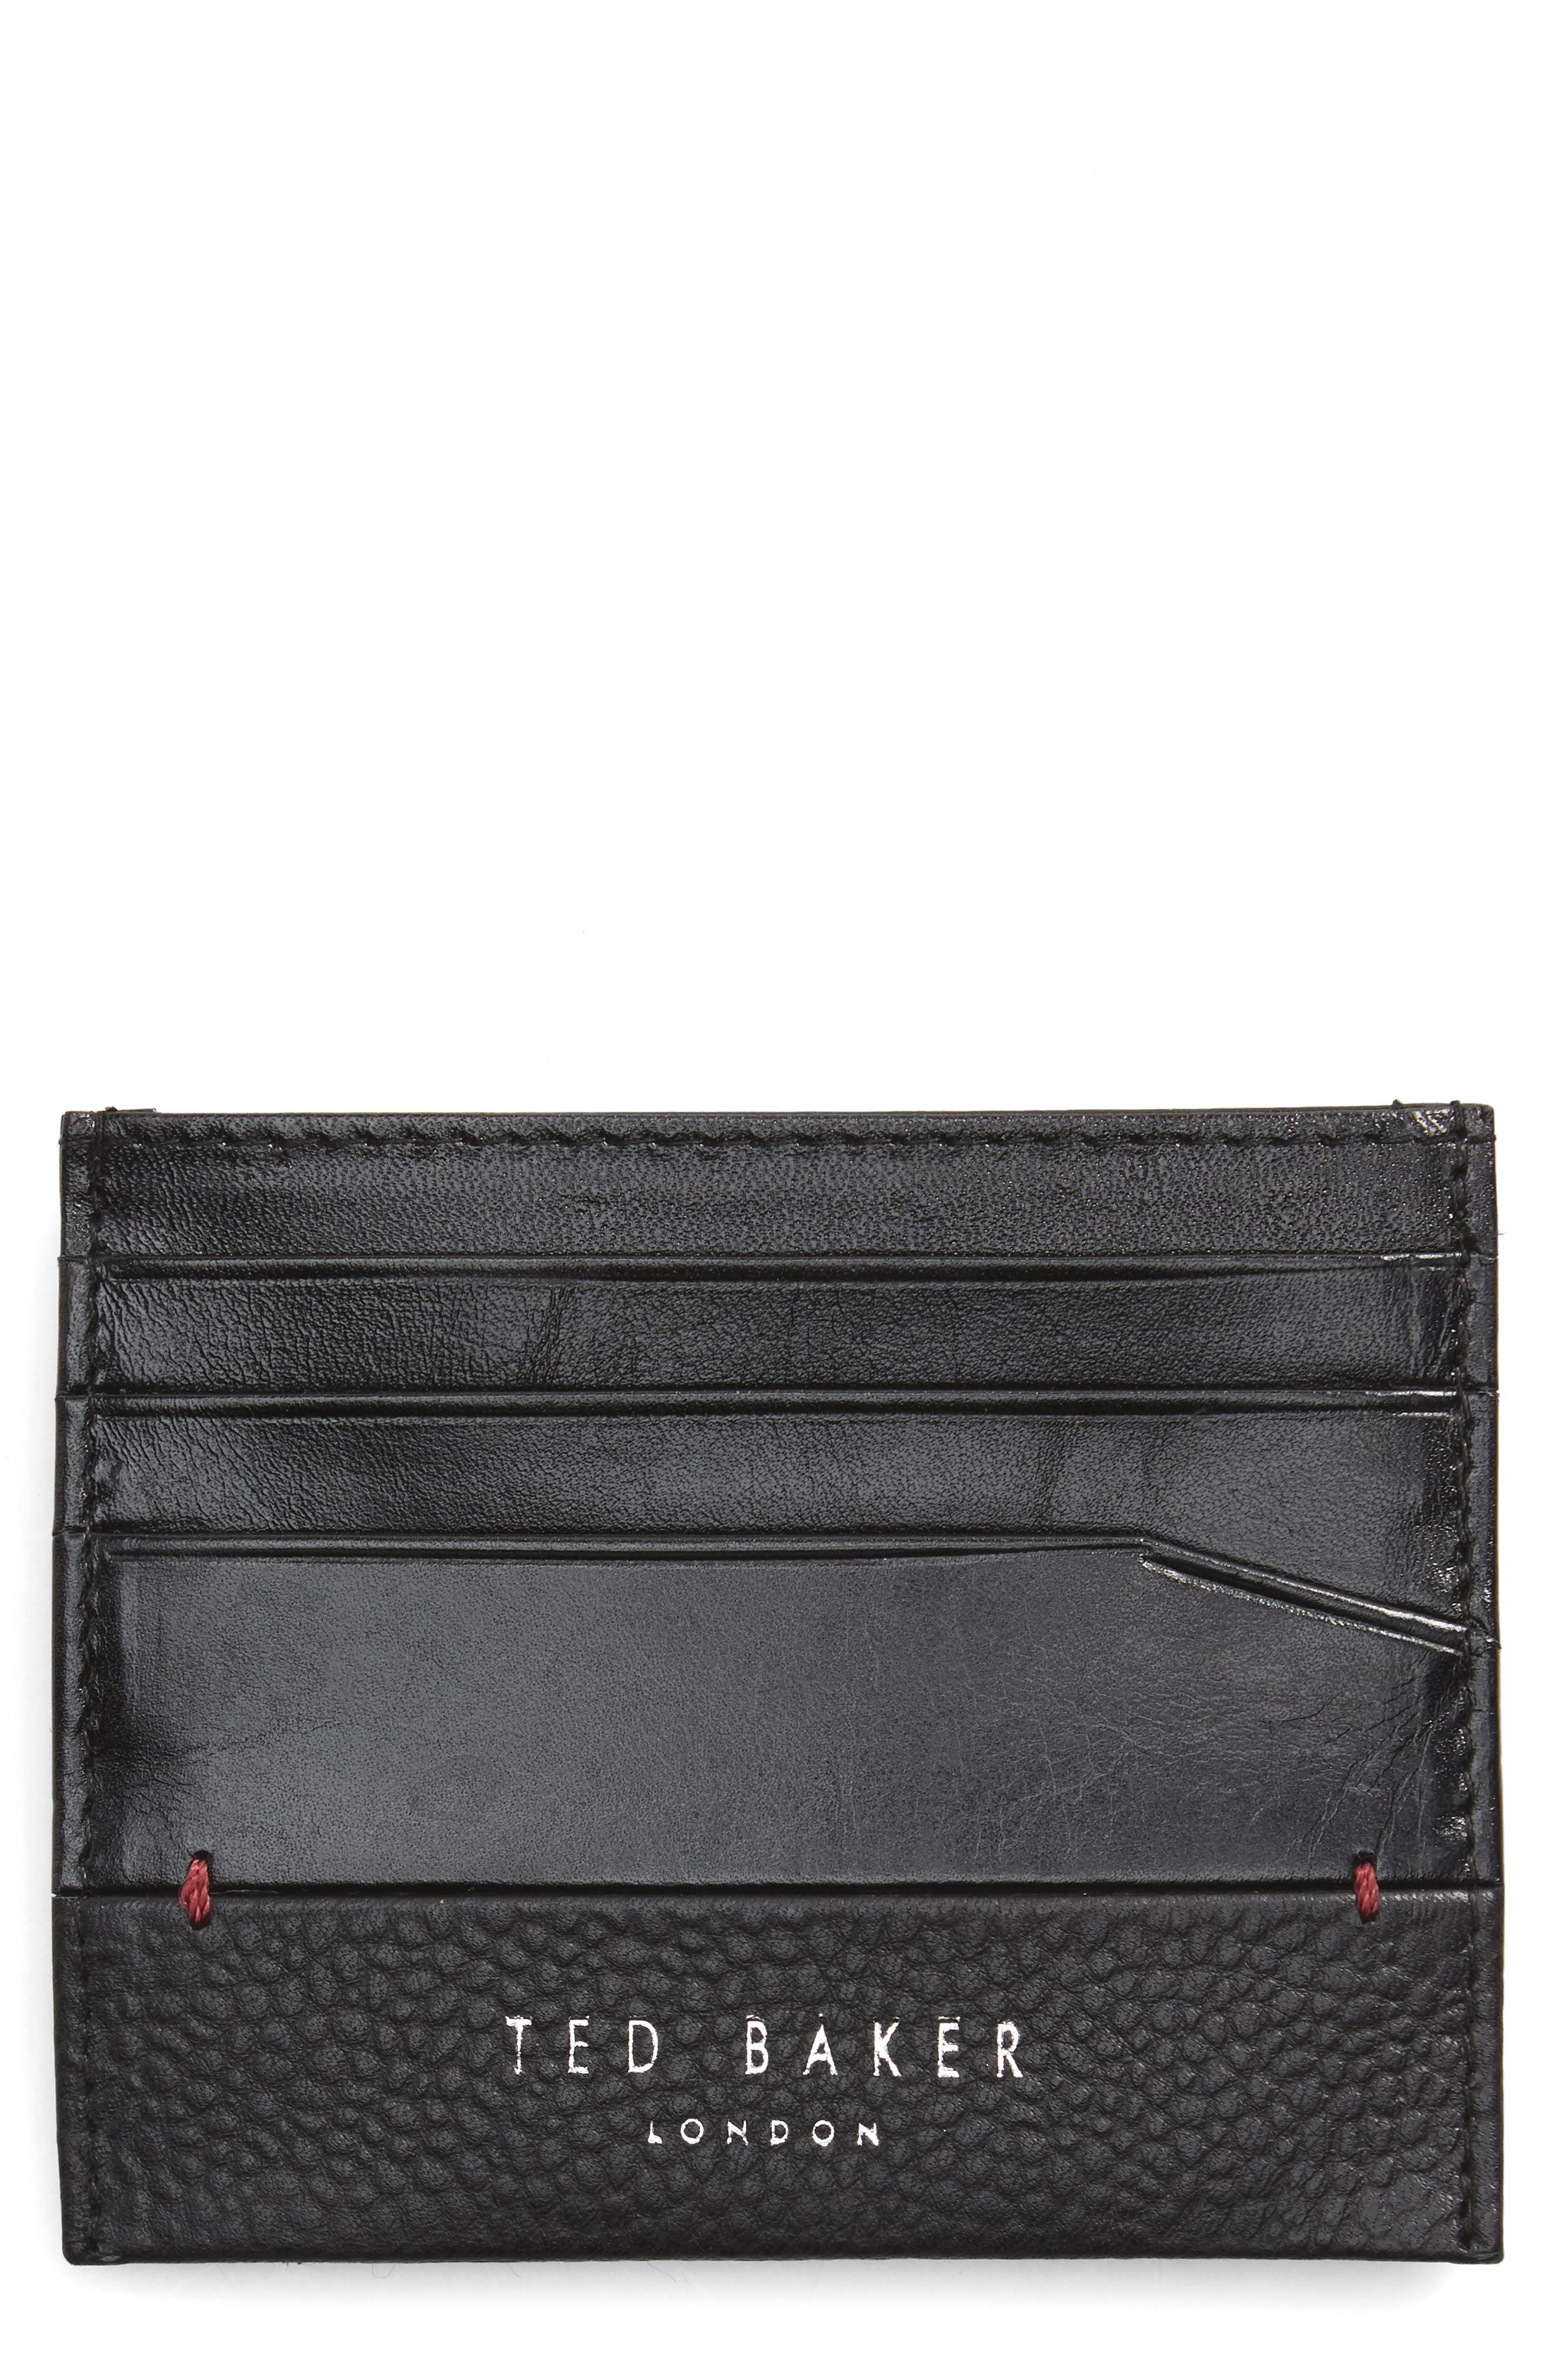 Ted Baker London Slippry Leather Card Case